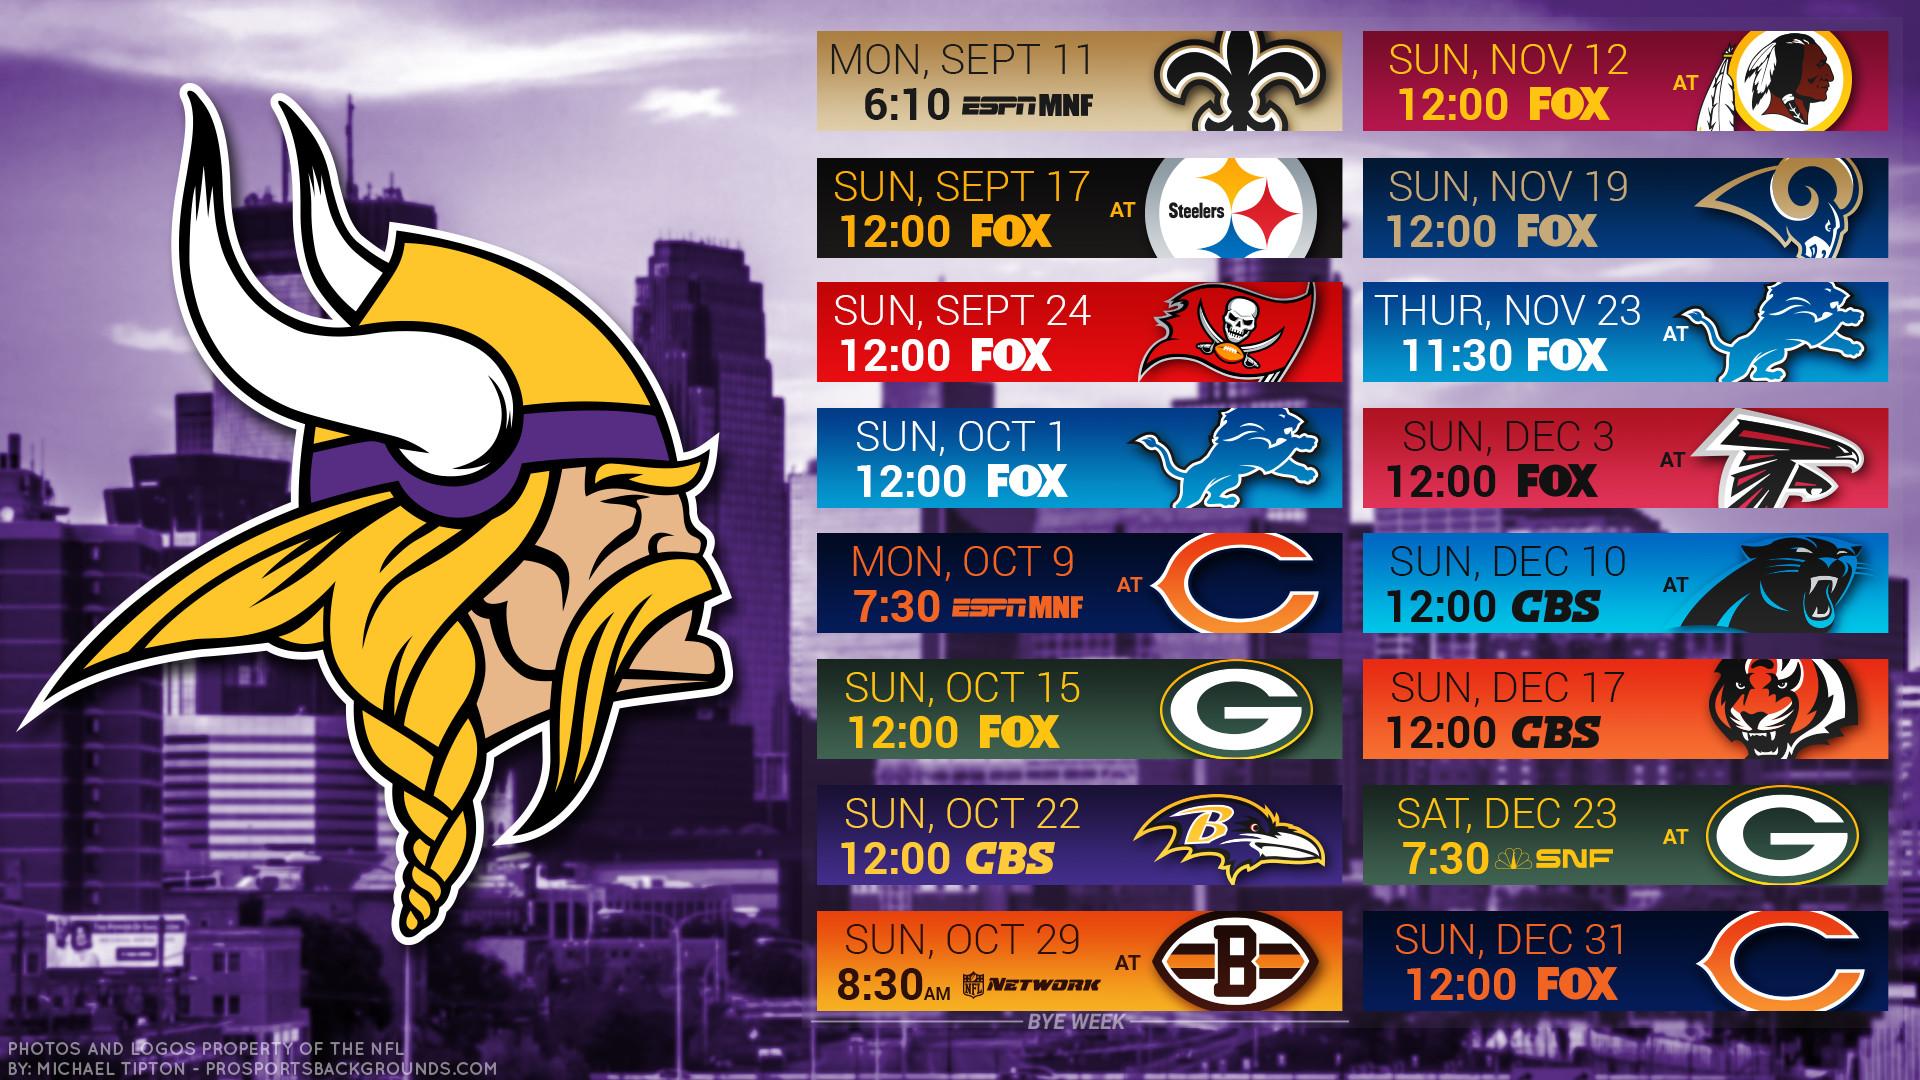 Minnesota Vikings 2017 schedule city football logo wallpaper free pc desktop  computer …